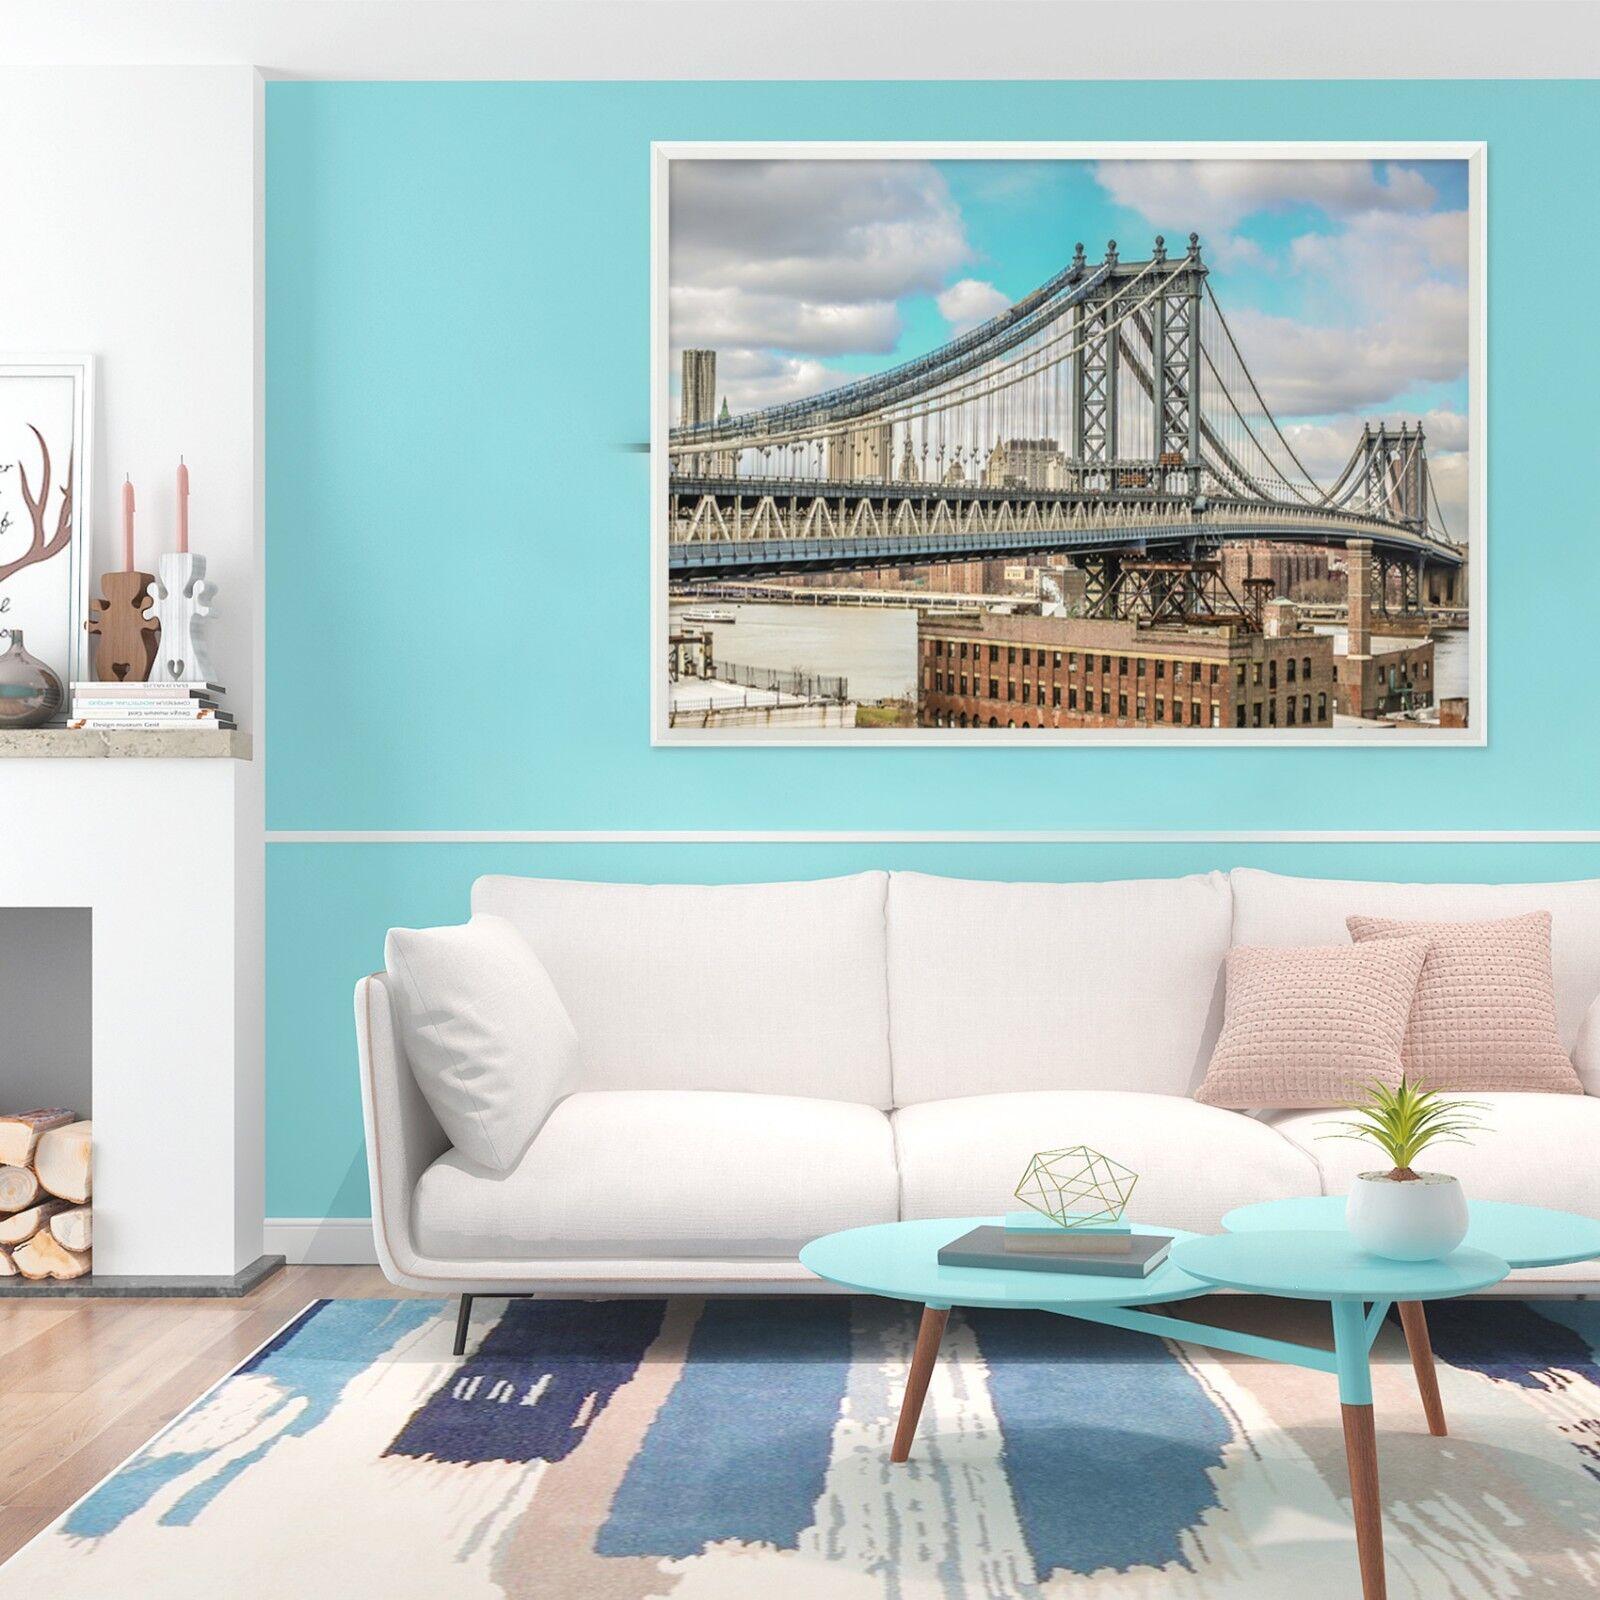 3D Bridge Buildings 1 Framed Poster Home Decor Print Painting Art AJ WALLPAPER